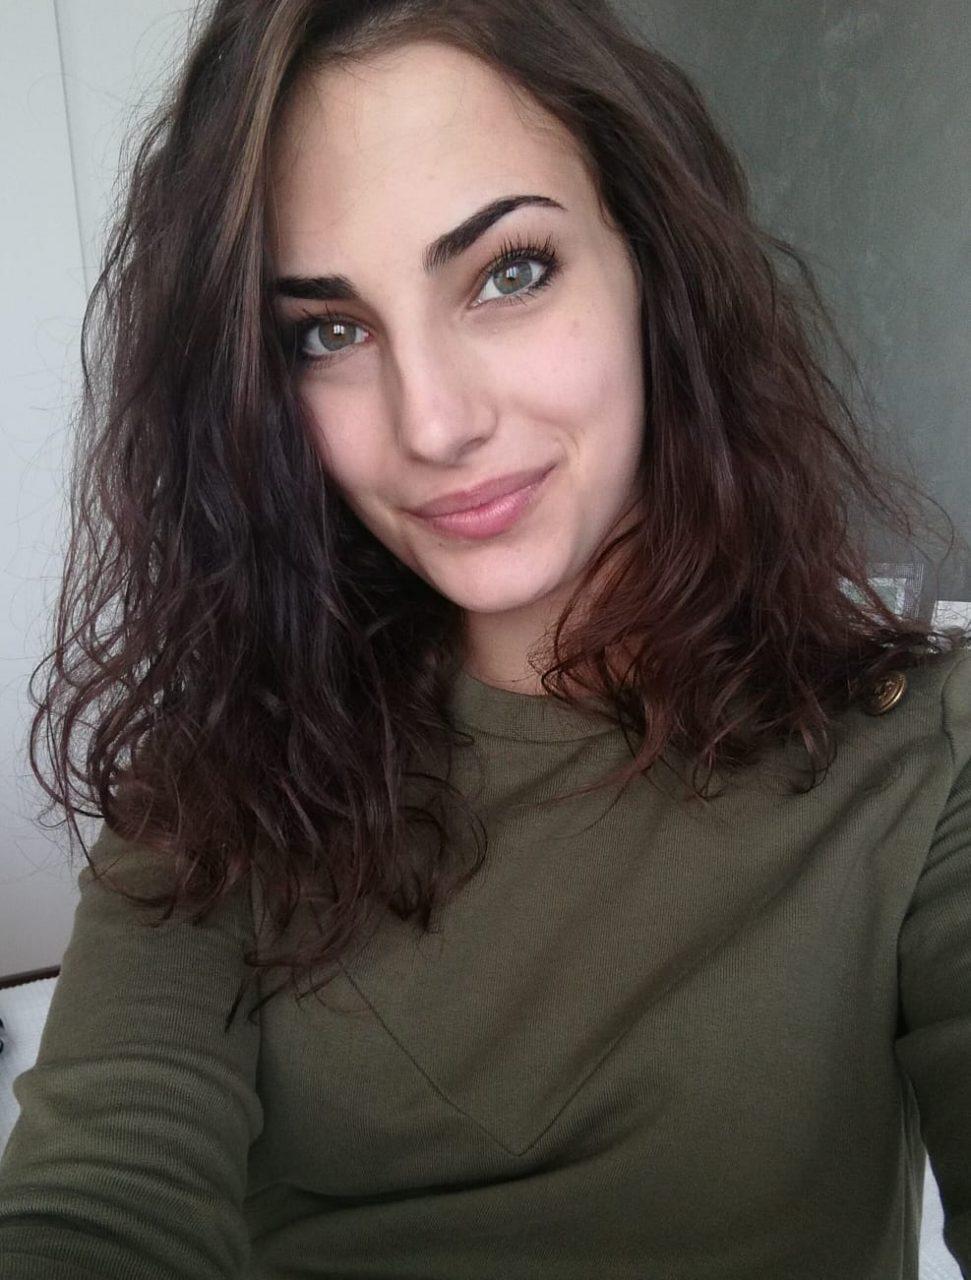 Mihaela Popovic